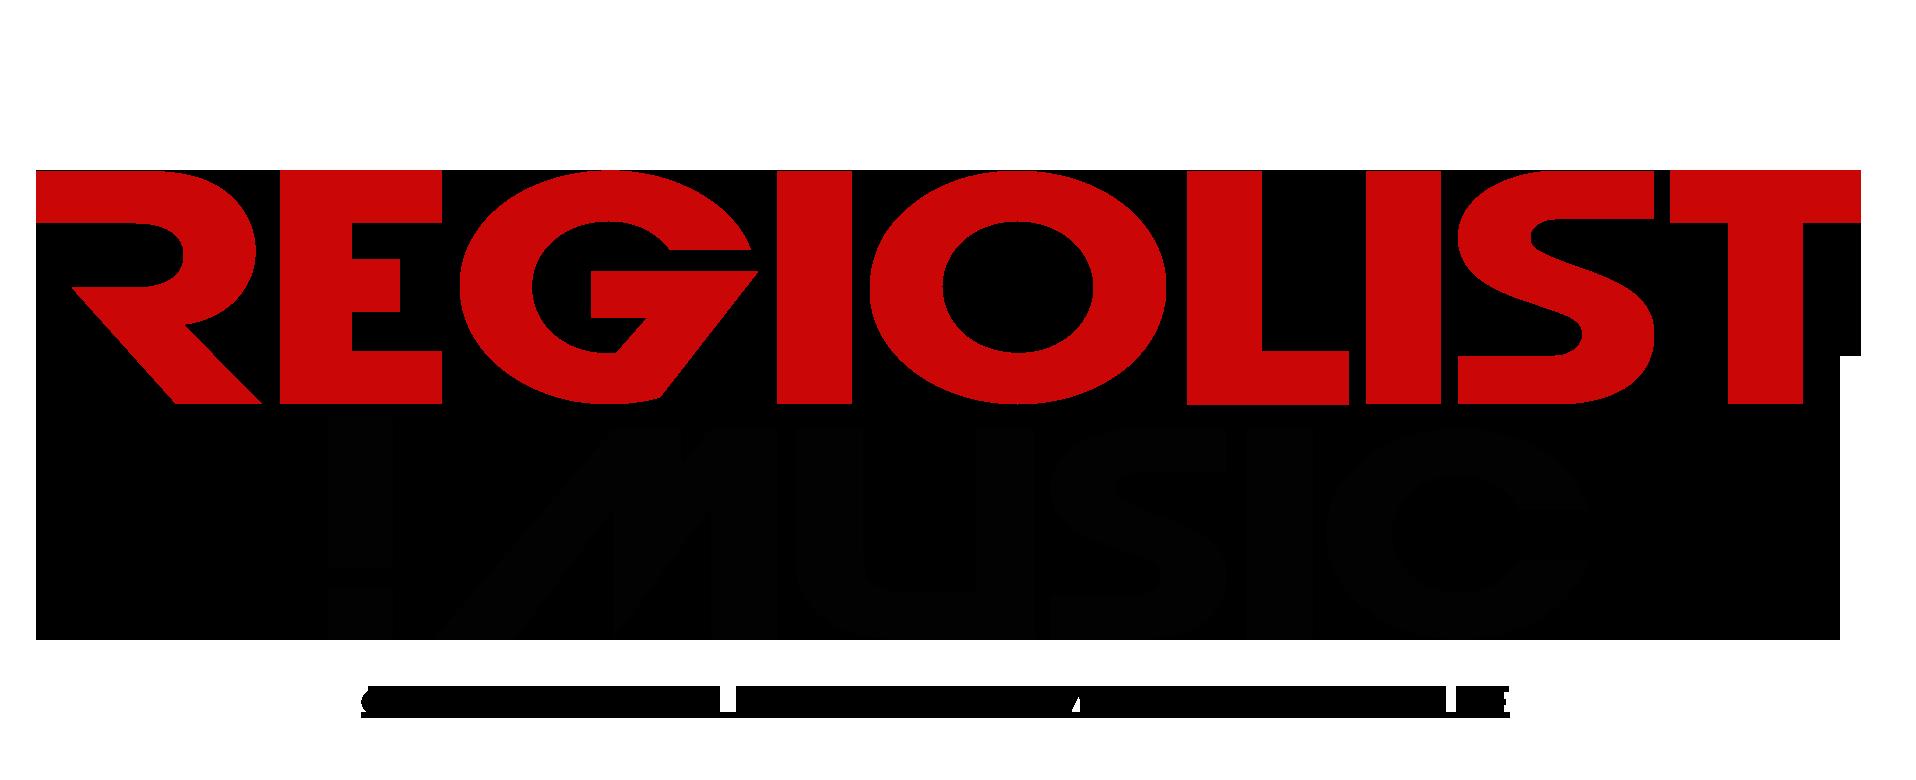 REGIOLIST MUSIC